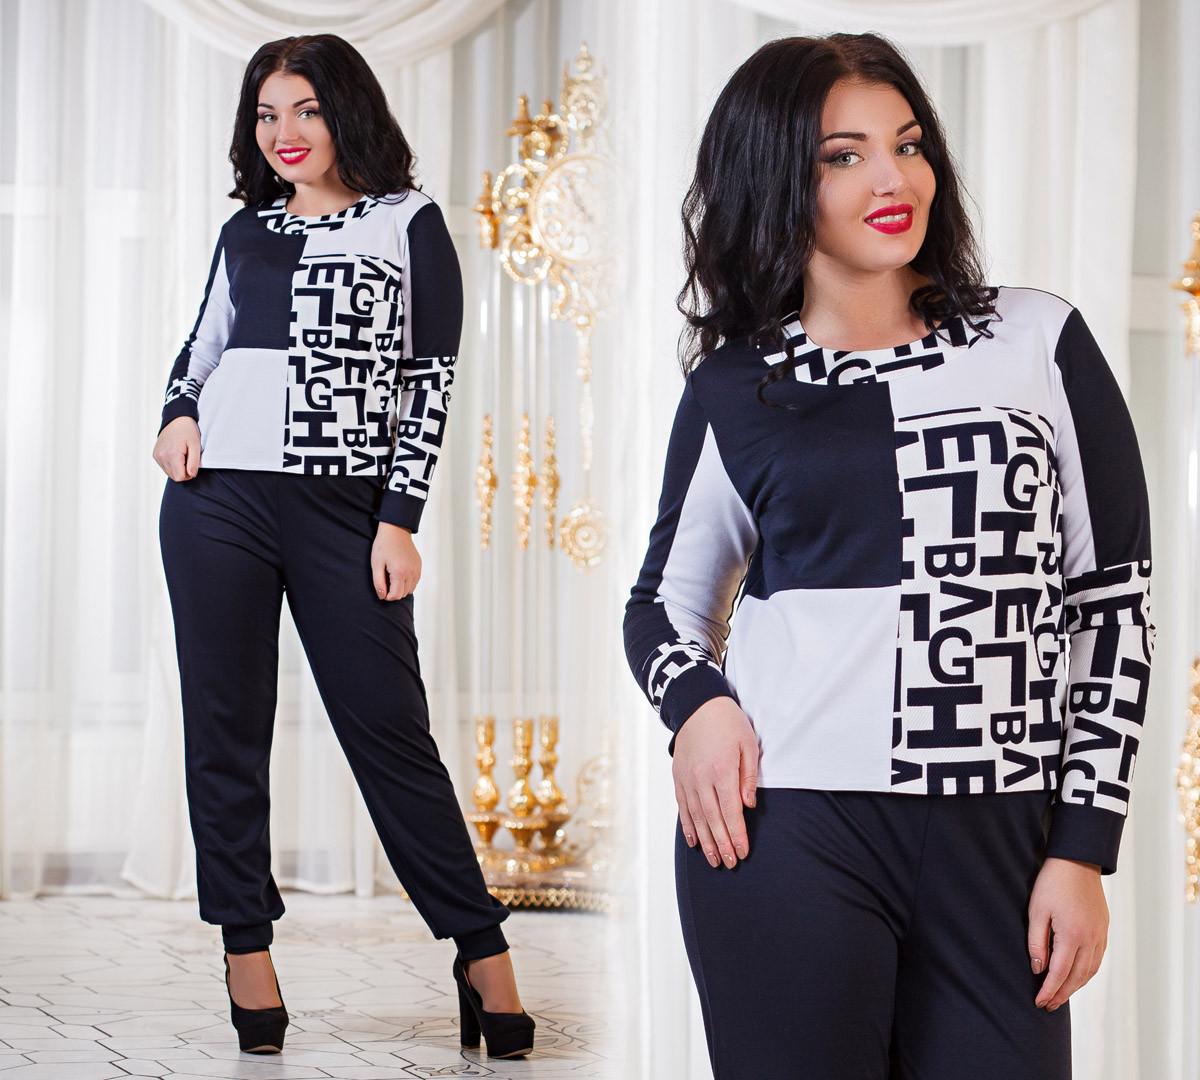 Д1033 Женский костюм  кофта+штаны размеры 50-56